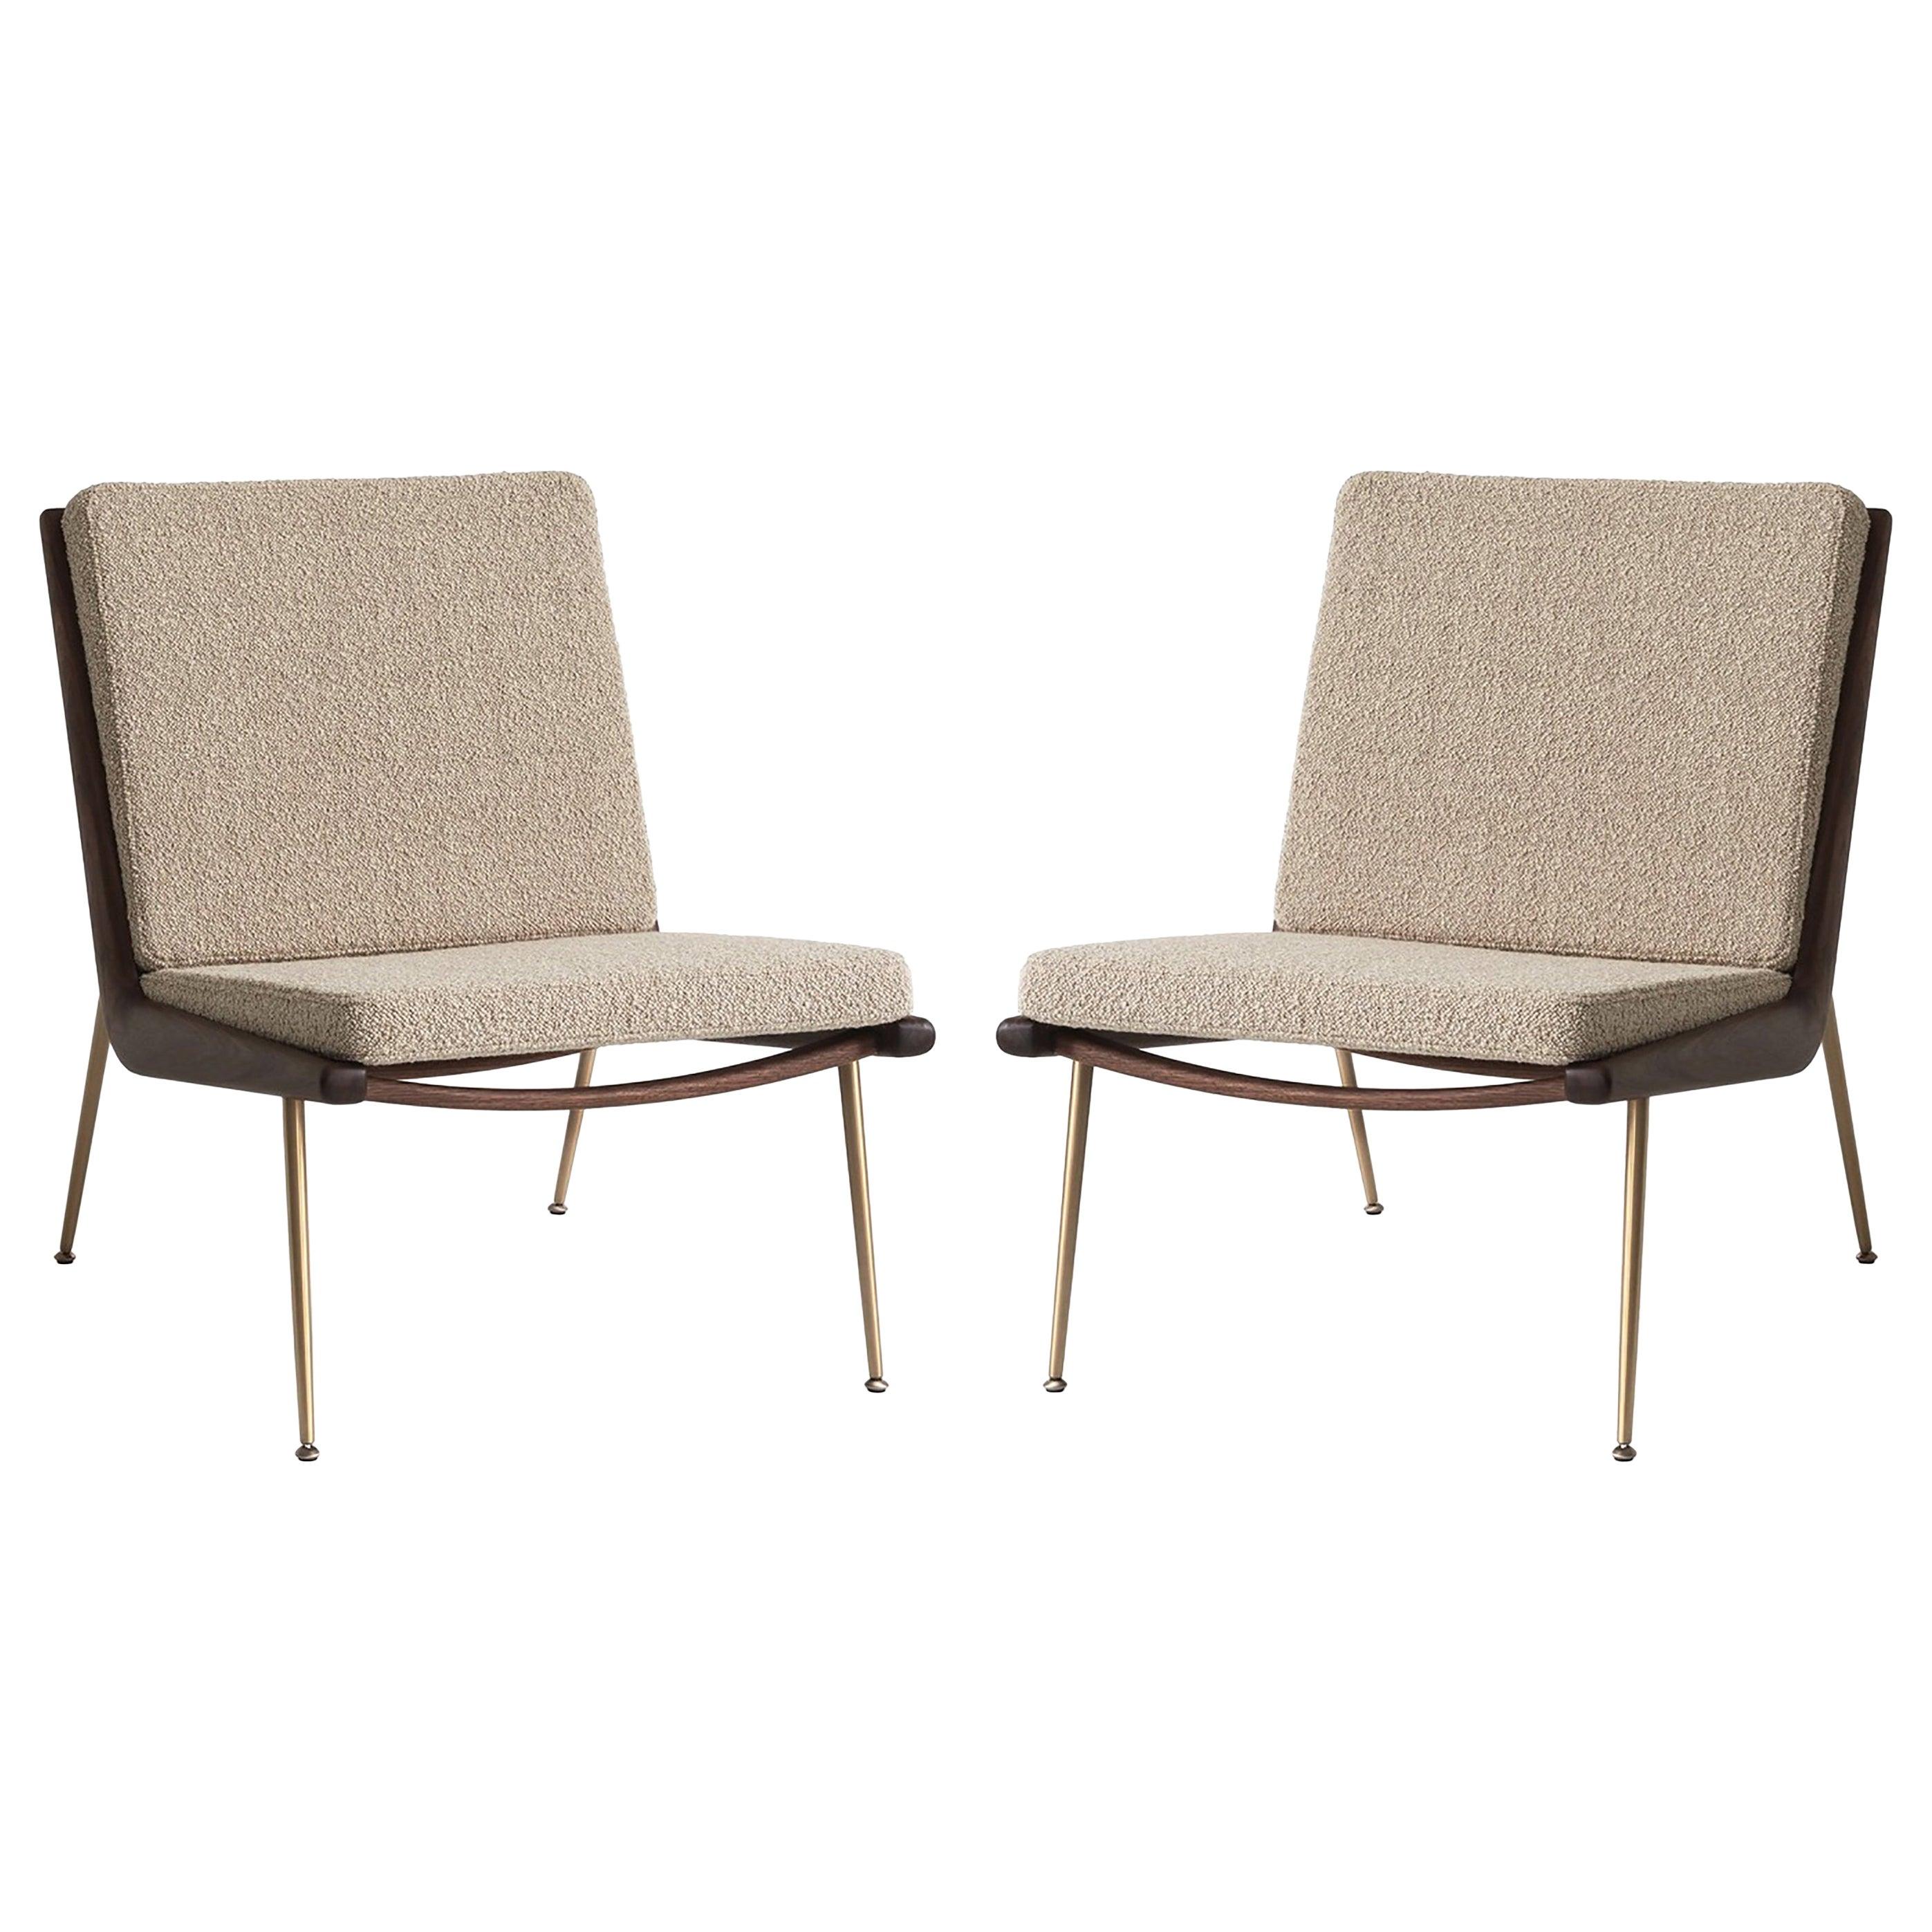 Mid-Century Modern Scandinavian Pair of Boomerang Lounge Chair